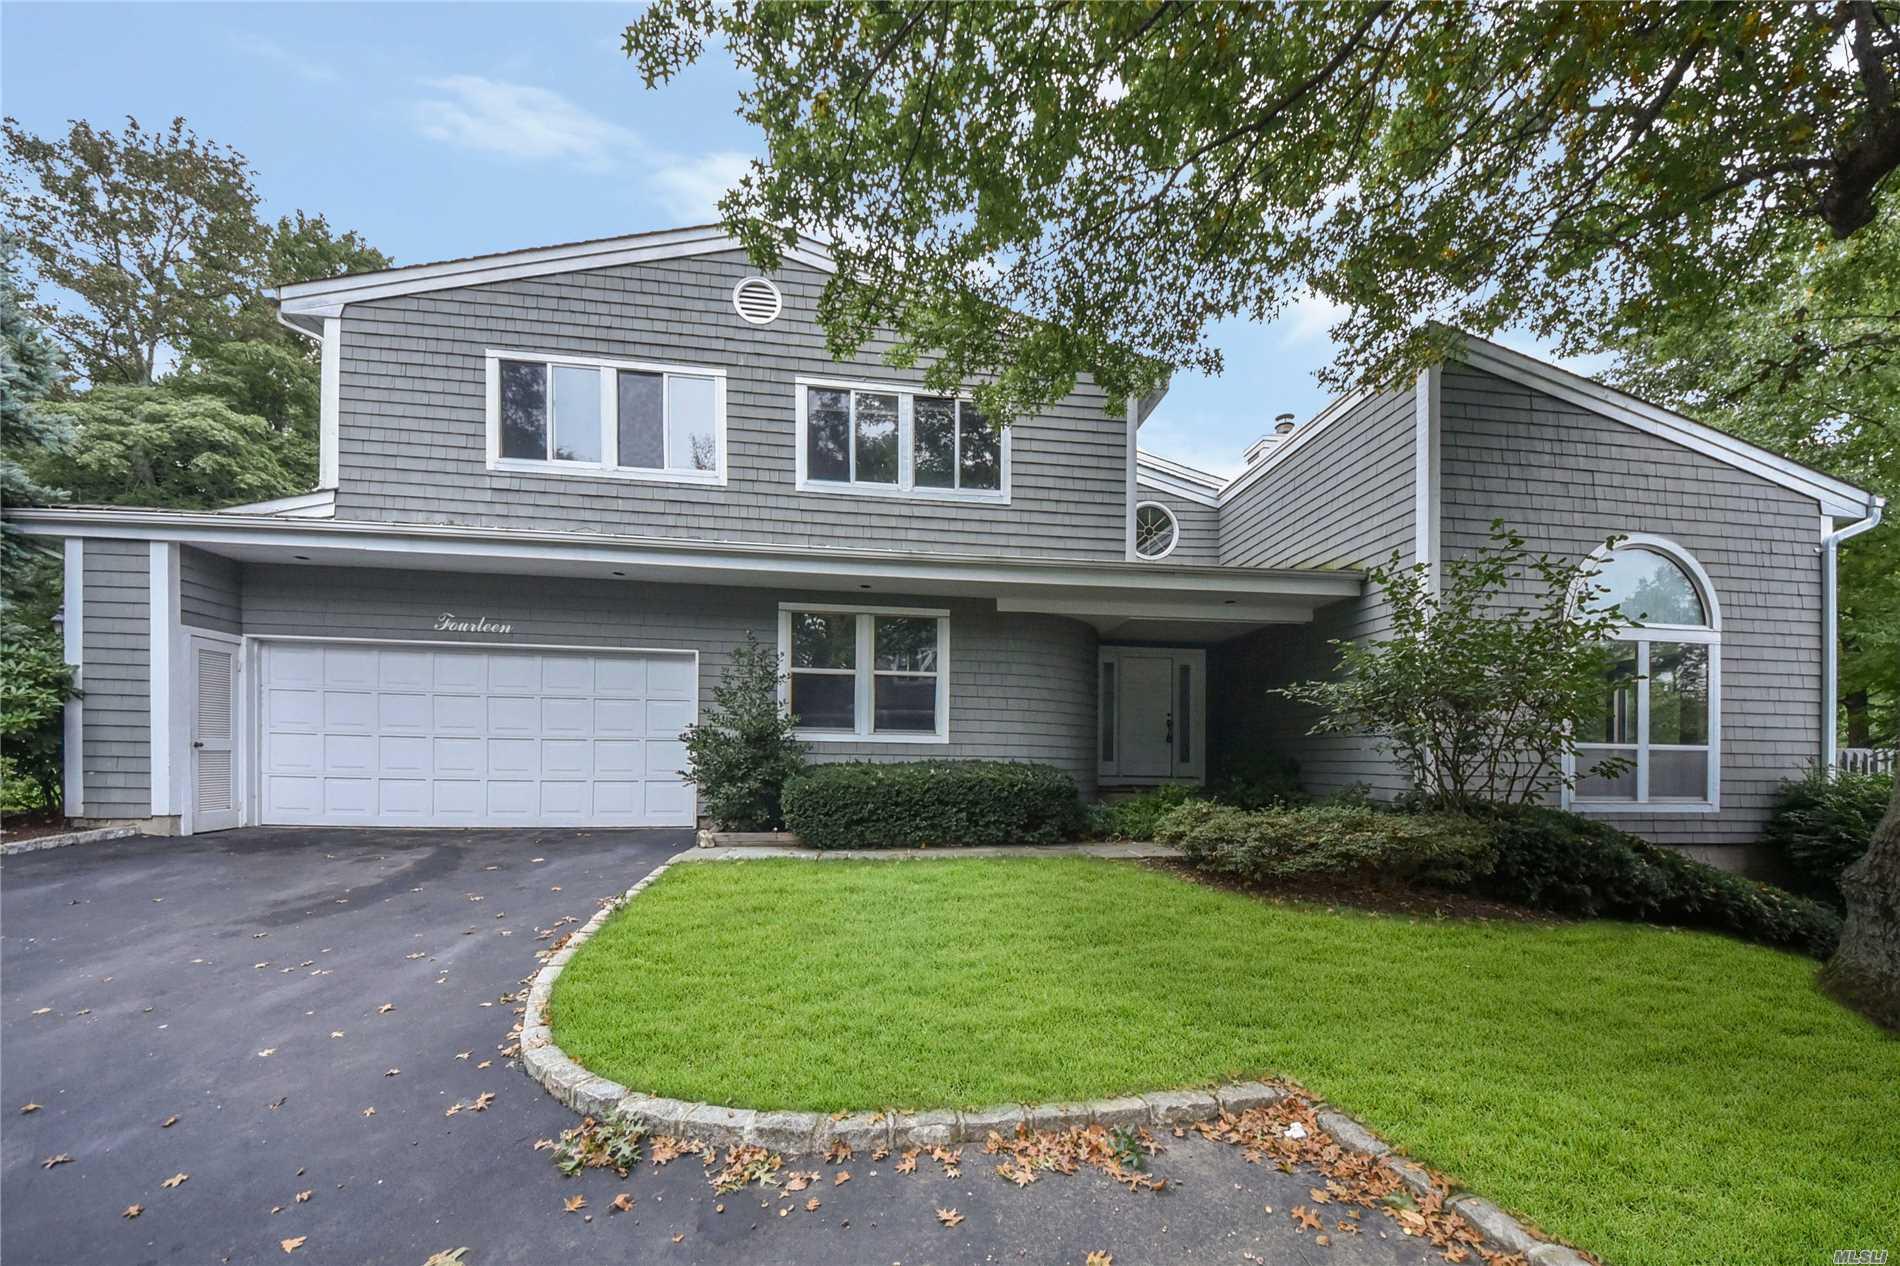 Property for sale at 14 Tiffany Cir, Manhasset,  NY 11030